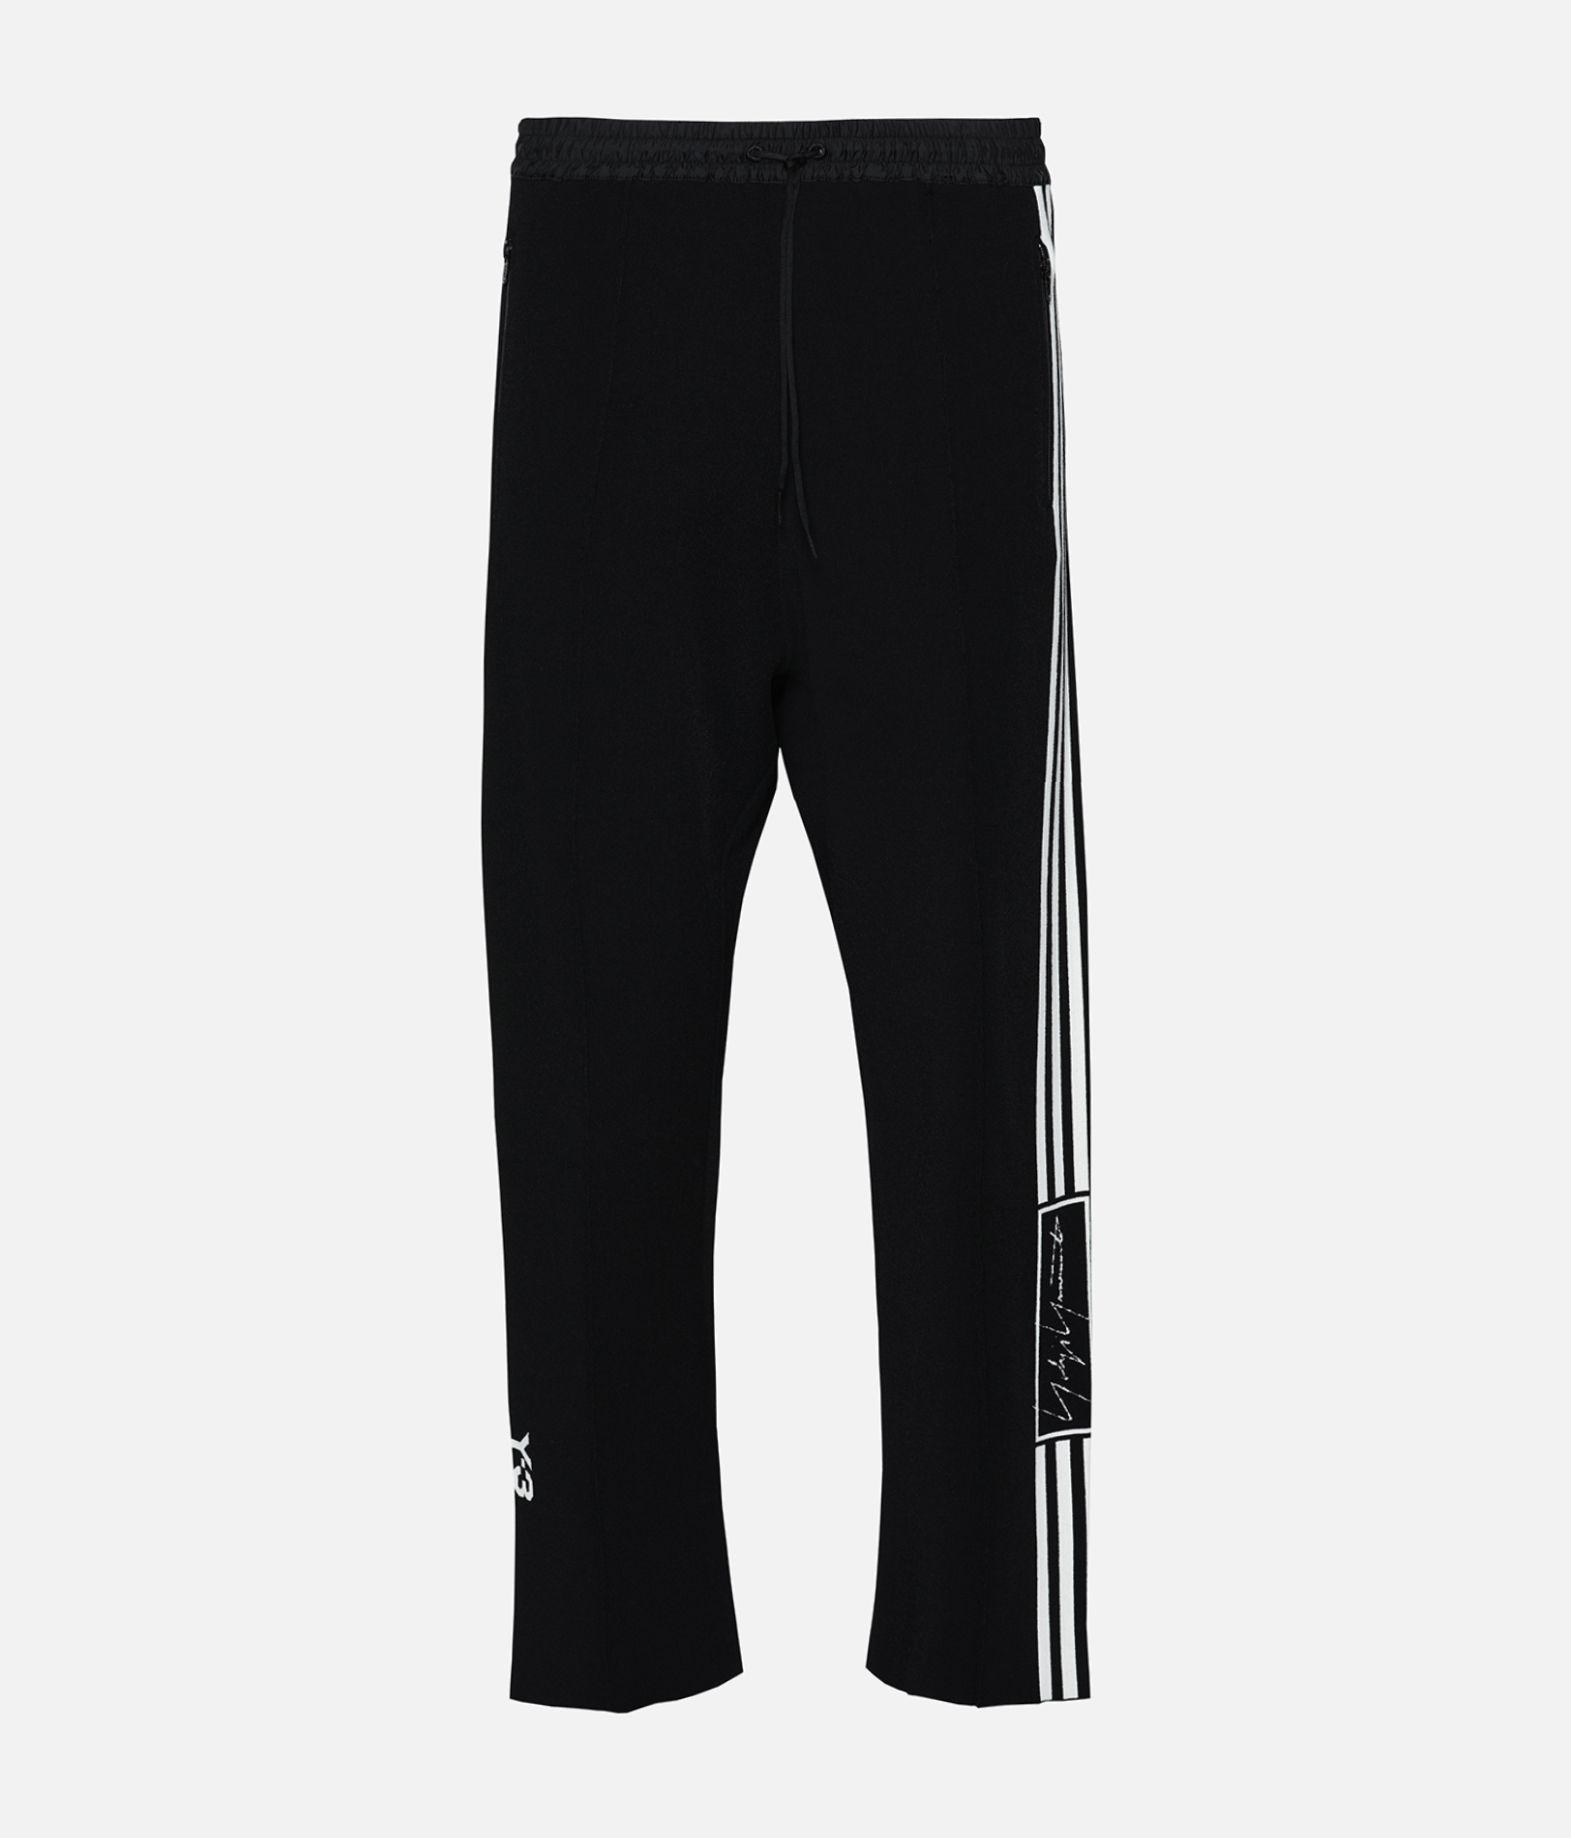 Y-3 Y-3 Tech Knit Wide Pants Casual pants Man f